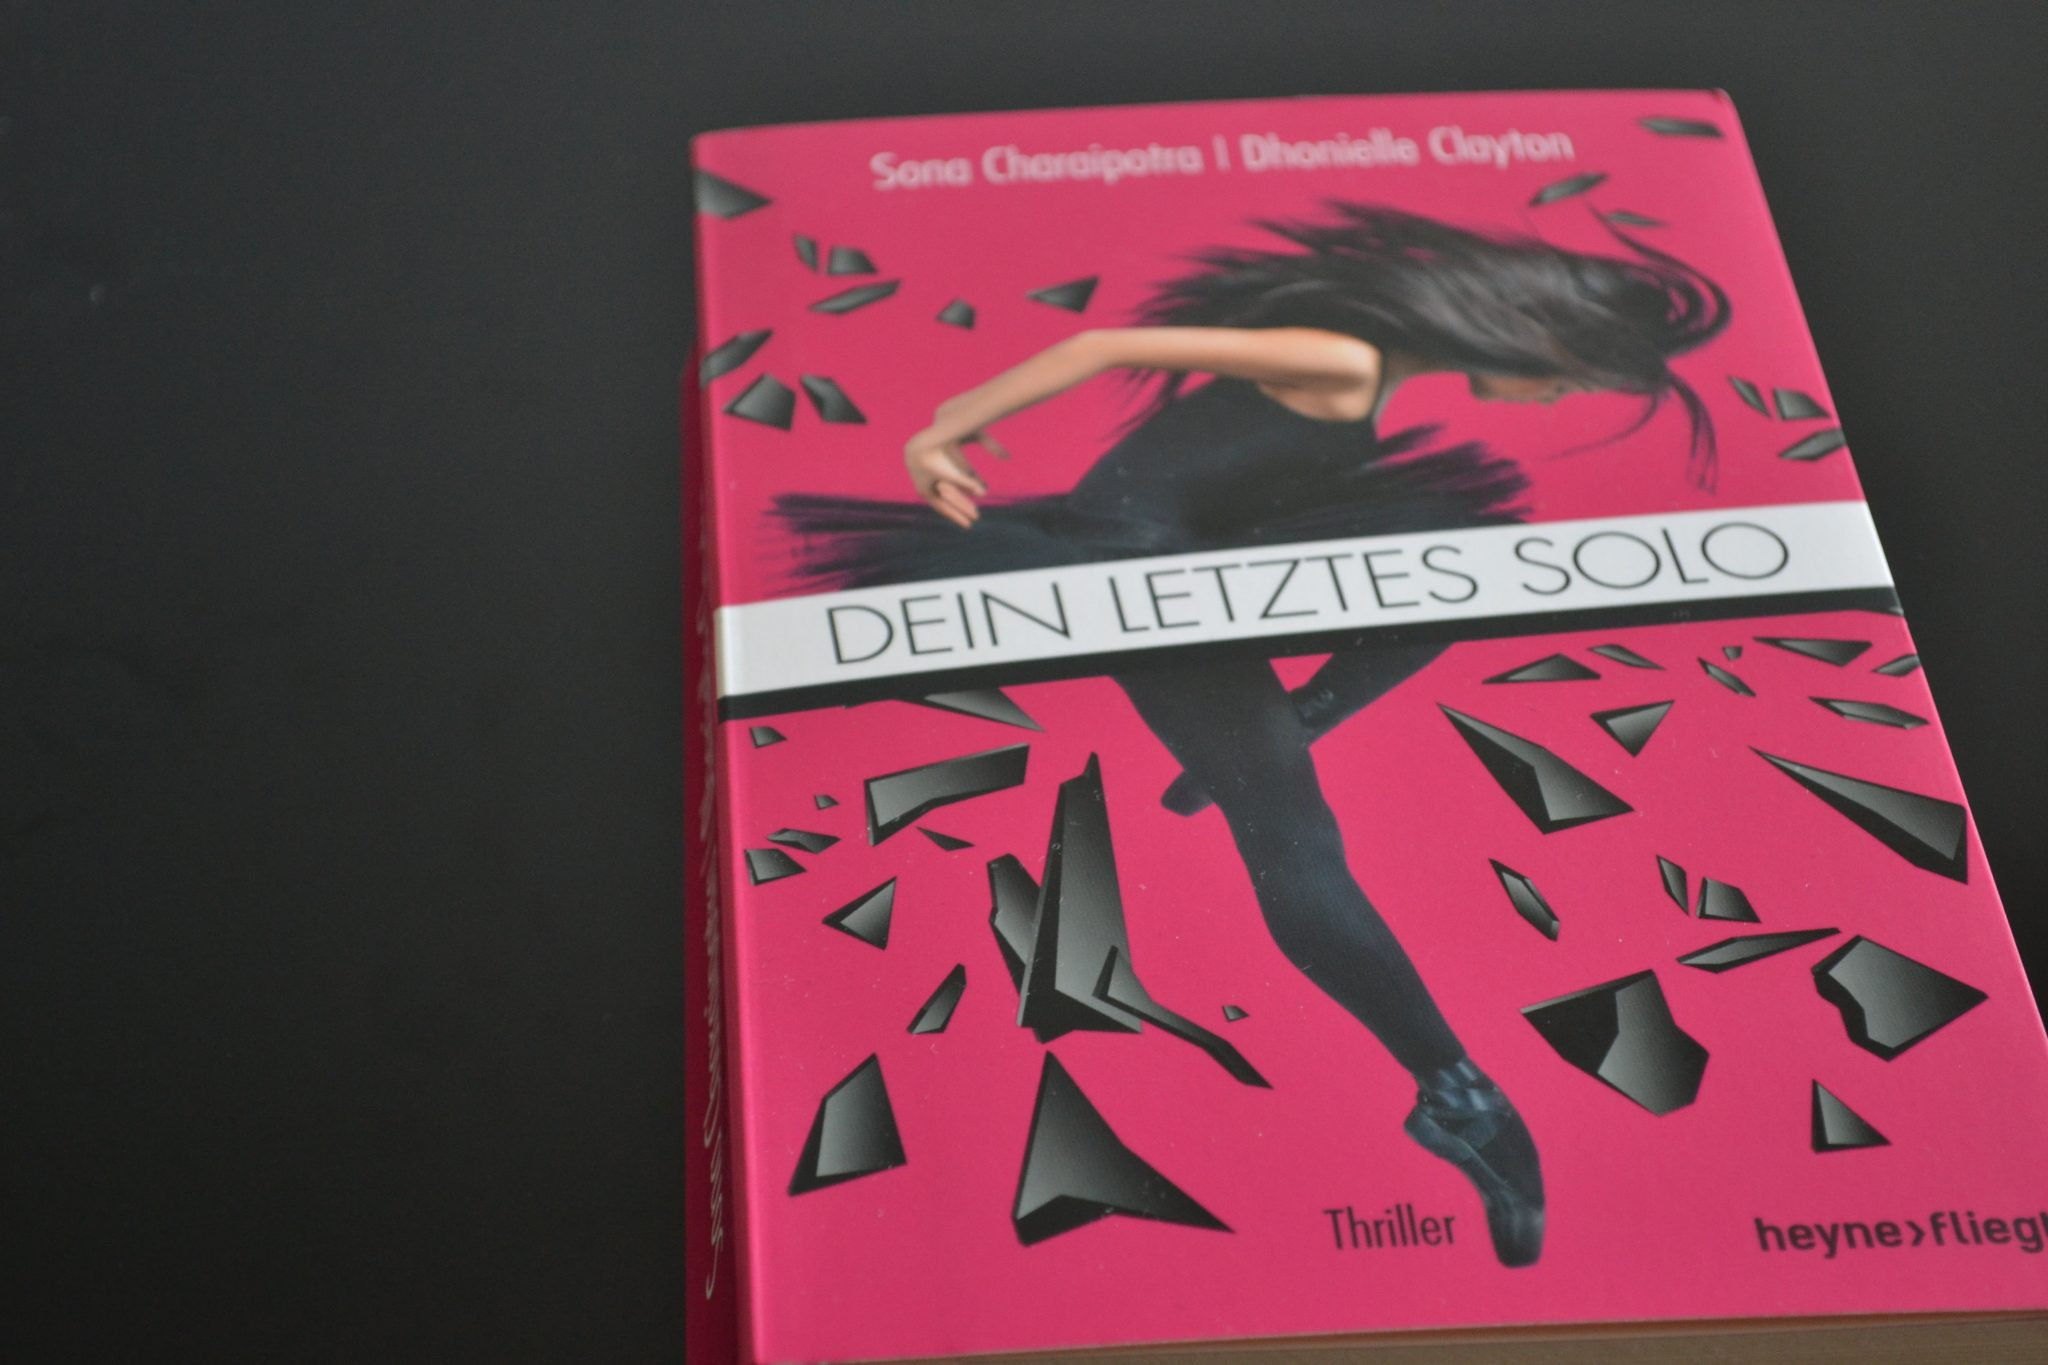 Books: Dein letztes Solo | Sona Charaipotra & Dhonielle Clayton - DSC 0101